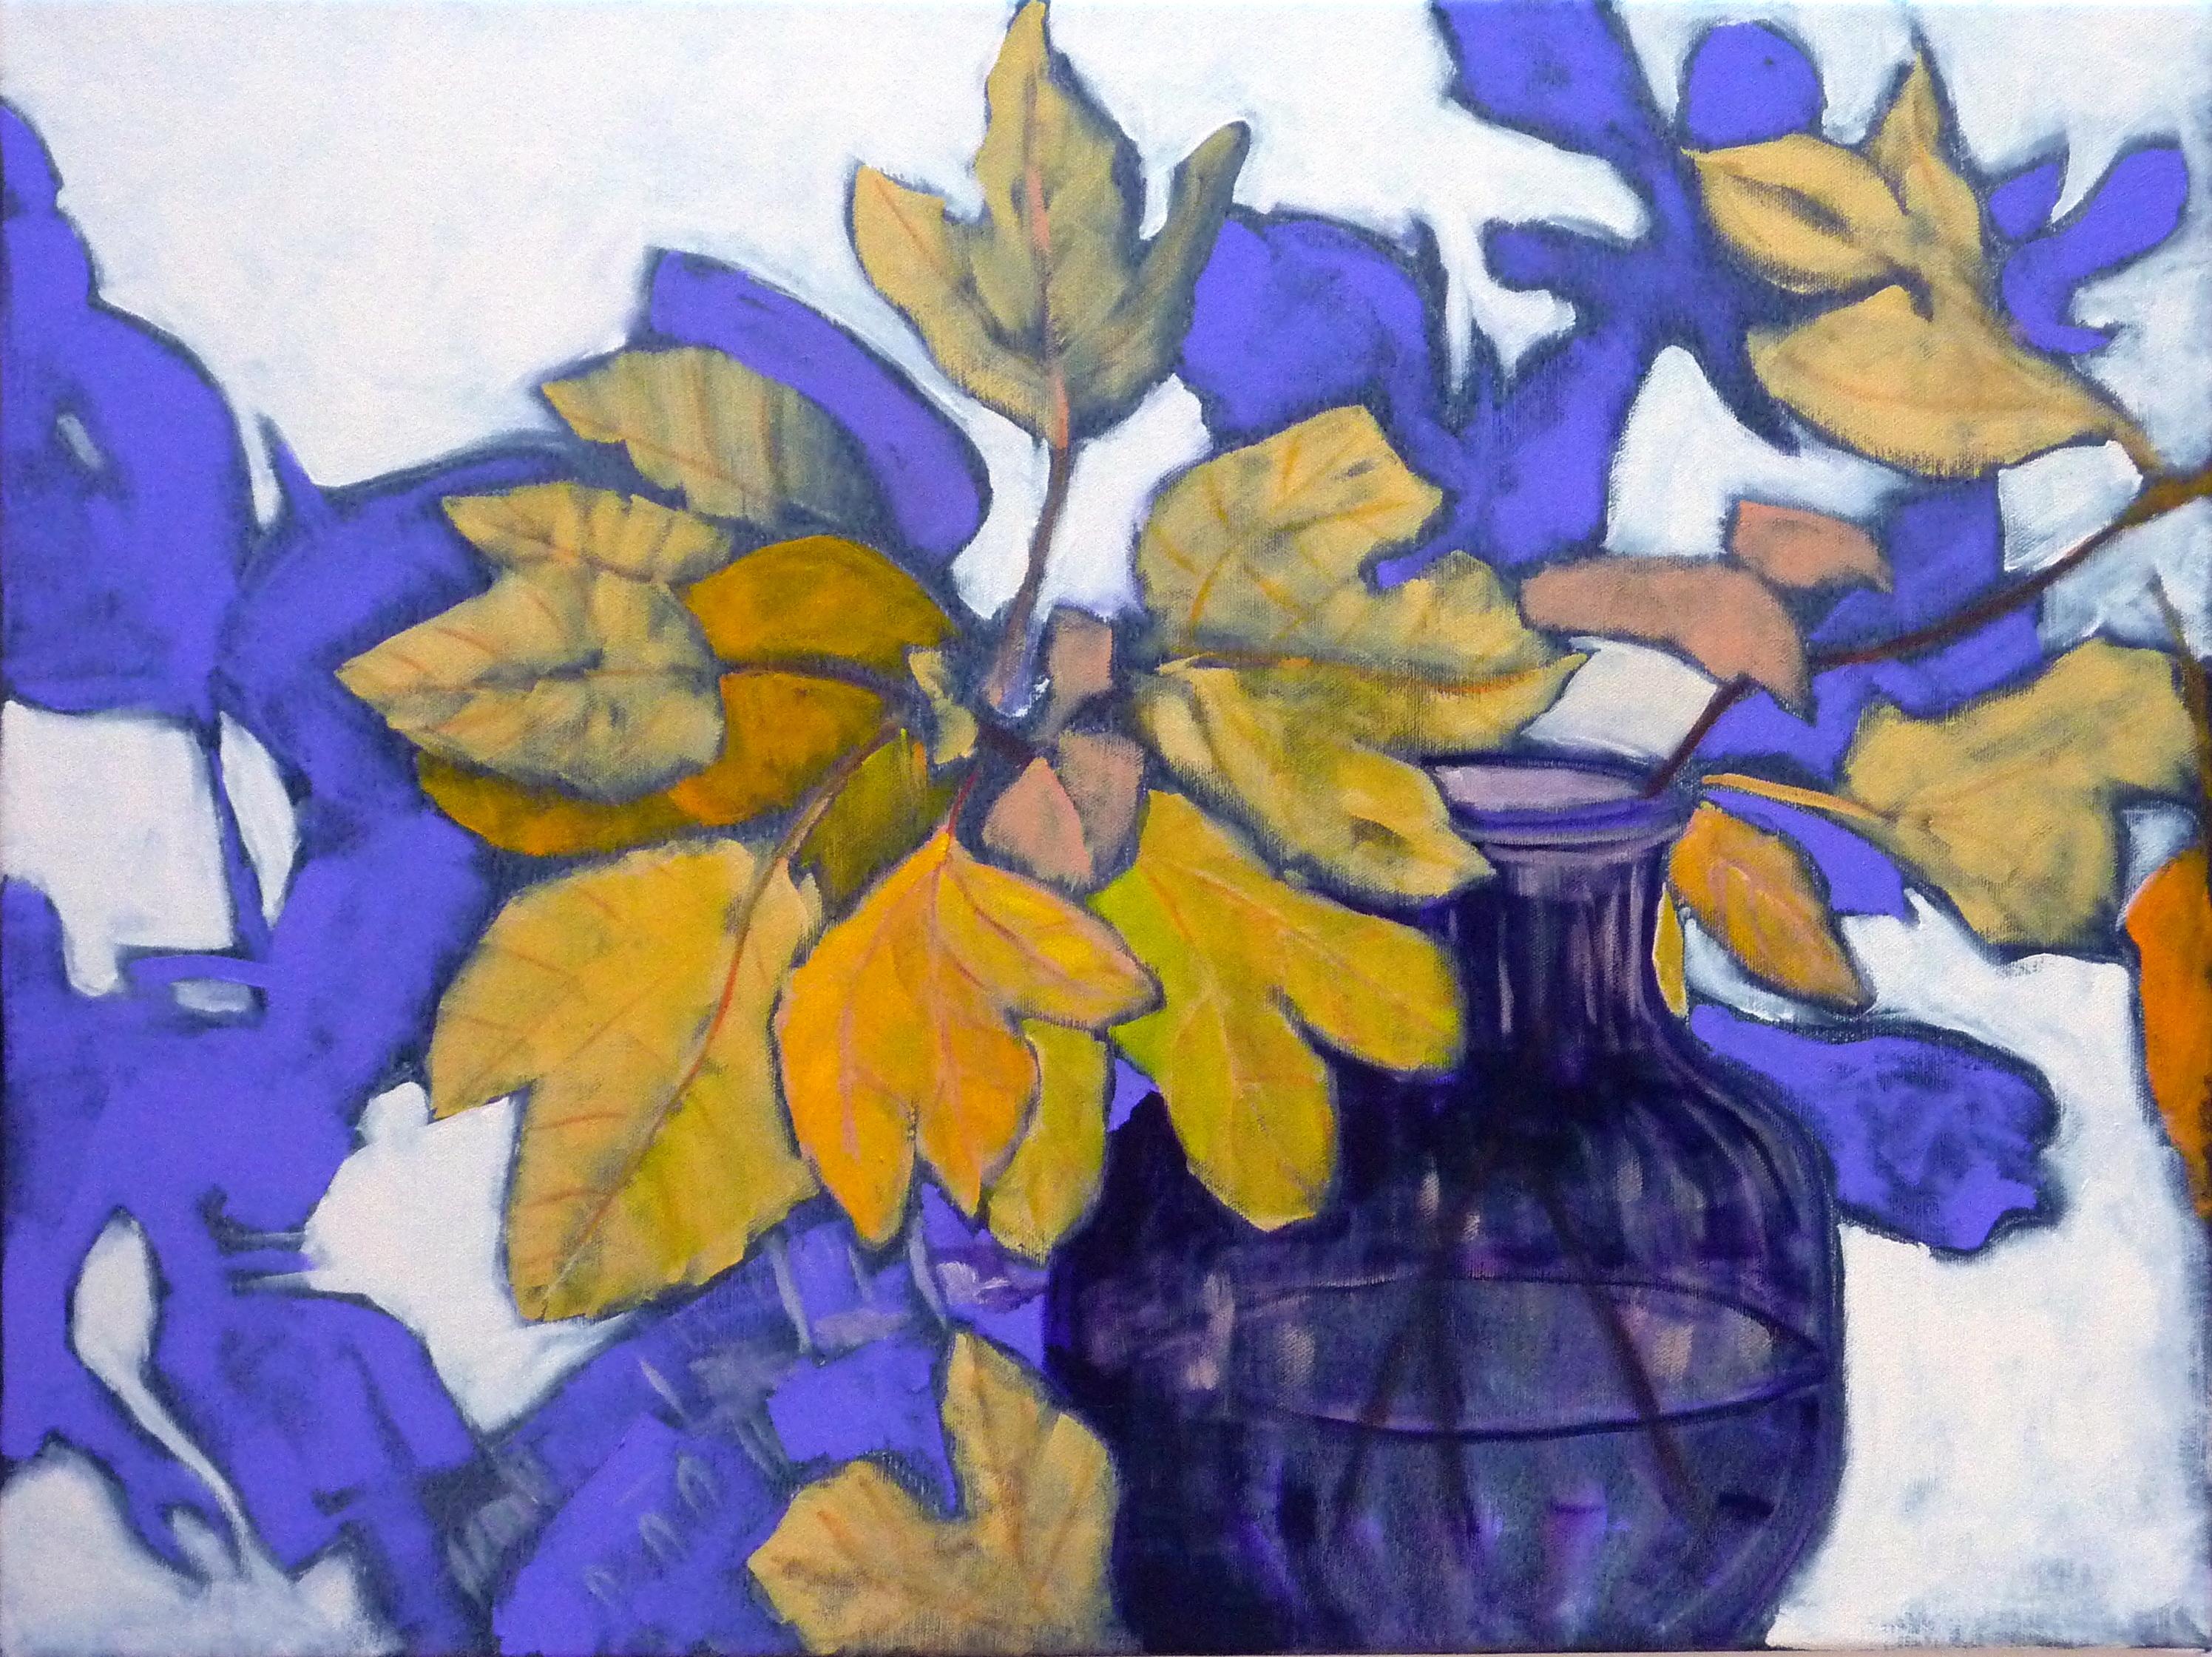 Autumn Leaves in Glass Vase